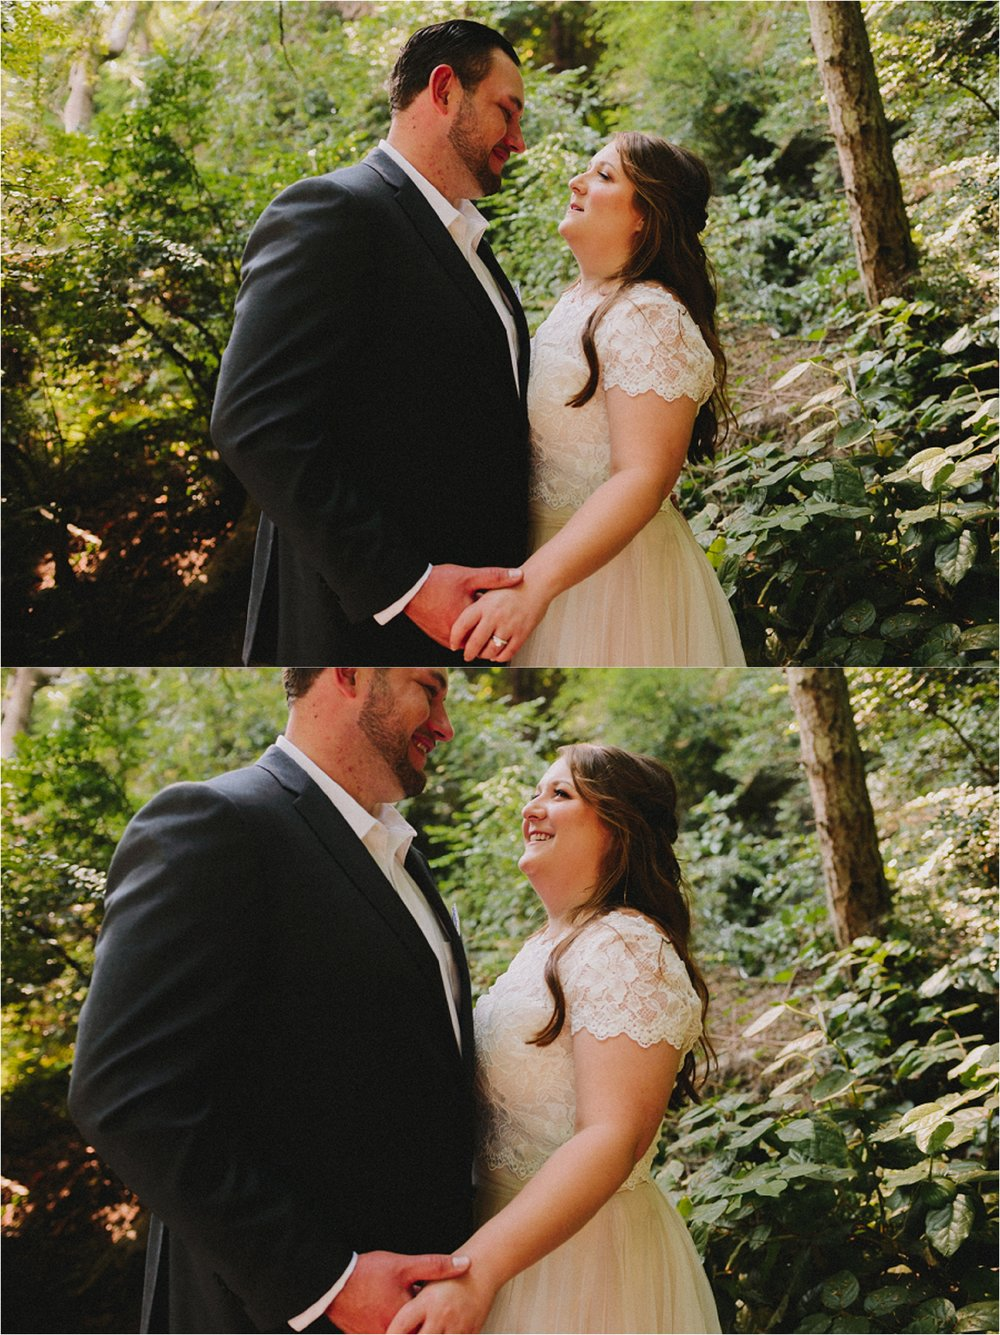 owen-beach-priest-point-park-tacoma-washington-elopement-jannicka-mayte-anchorage-alaska-wedding-elopement-photographer (32).jpg